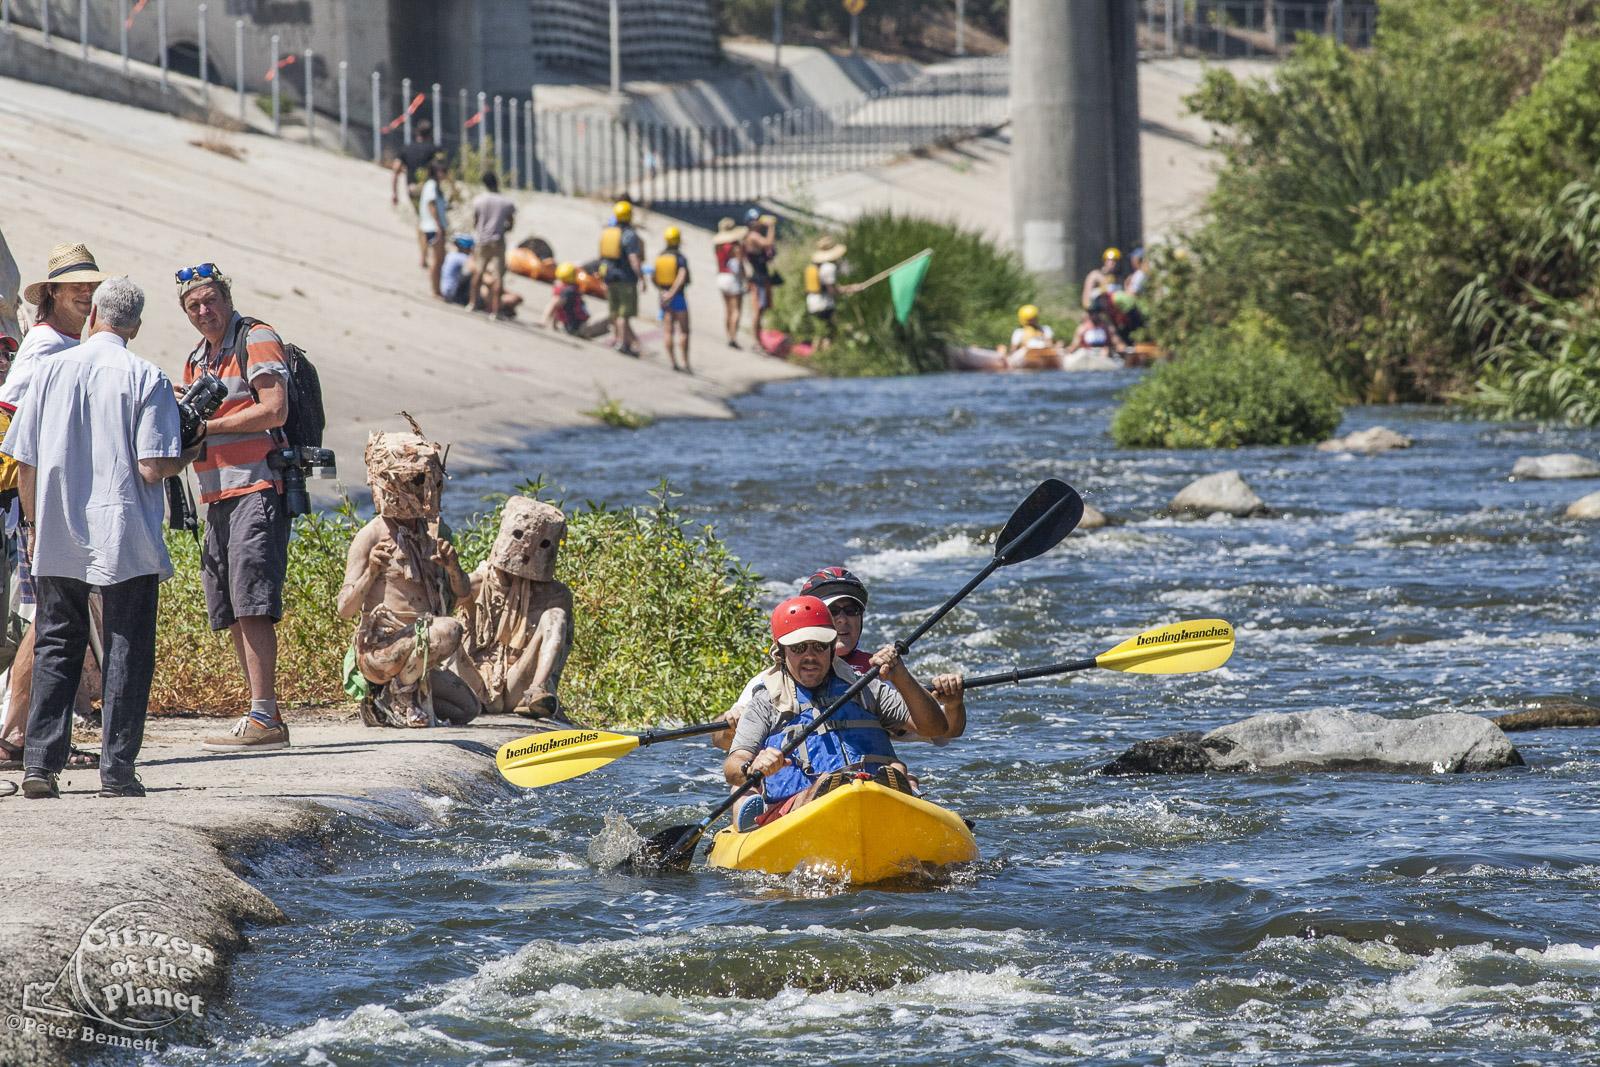 US_CA_48_3874_la_river_boat_race.jpg